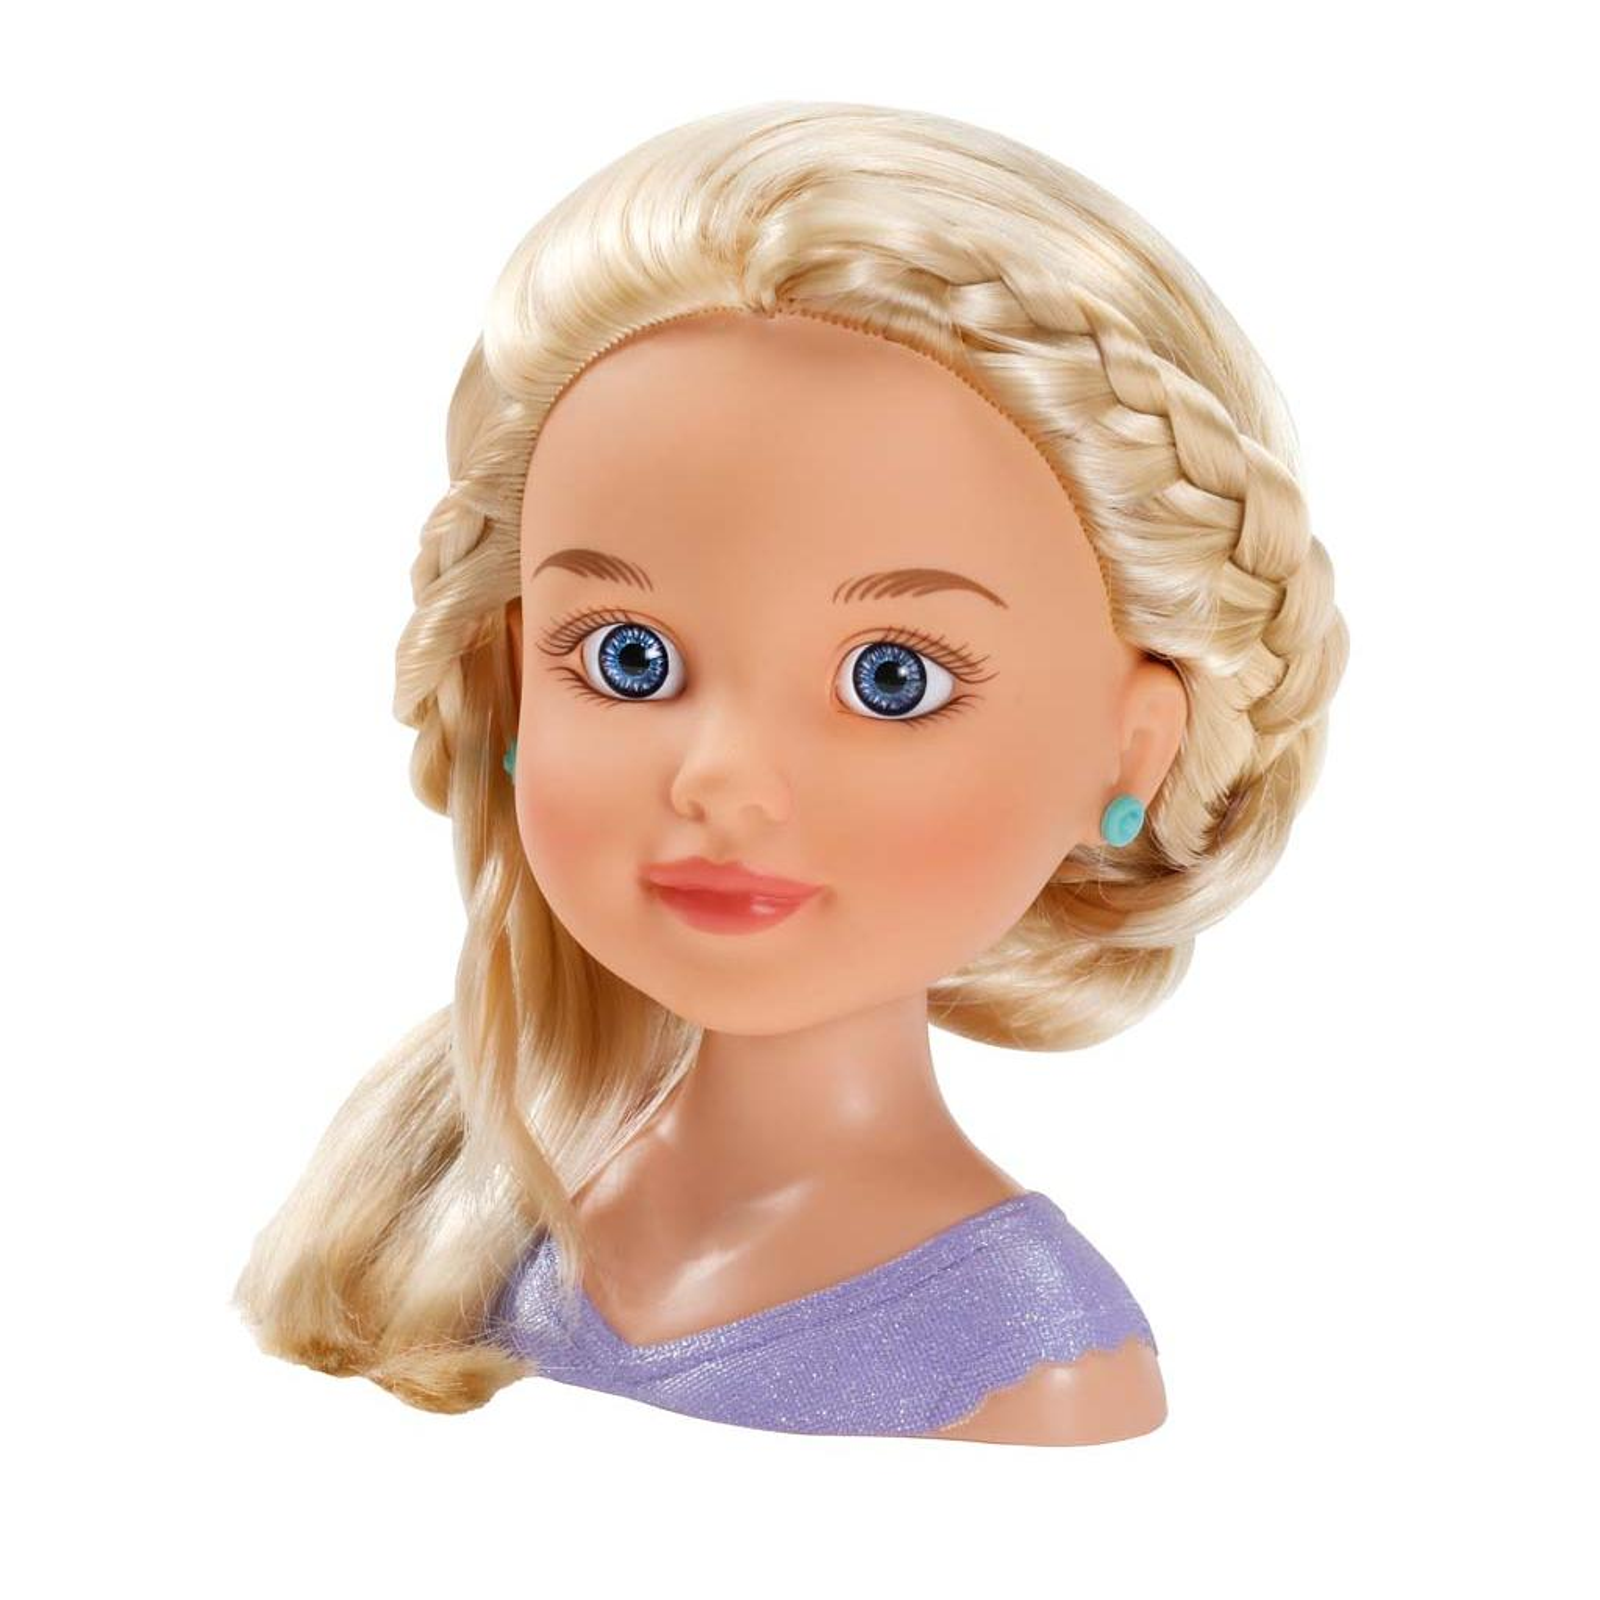 Кукла Zapf Манекен My Model Визажист (951576) изображение 3